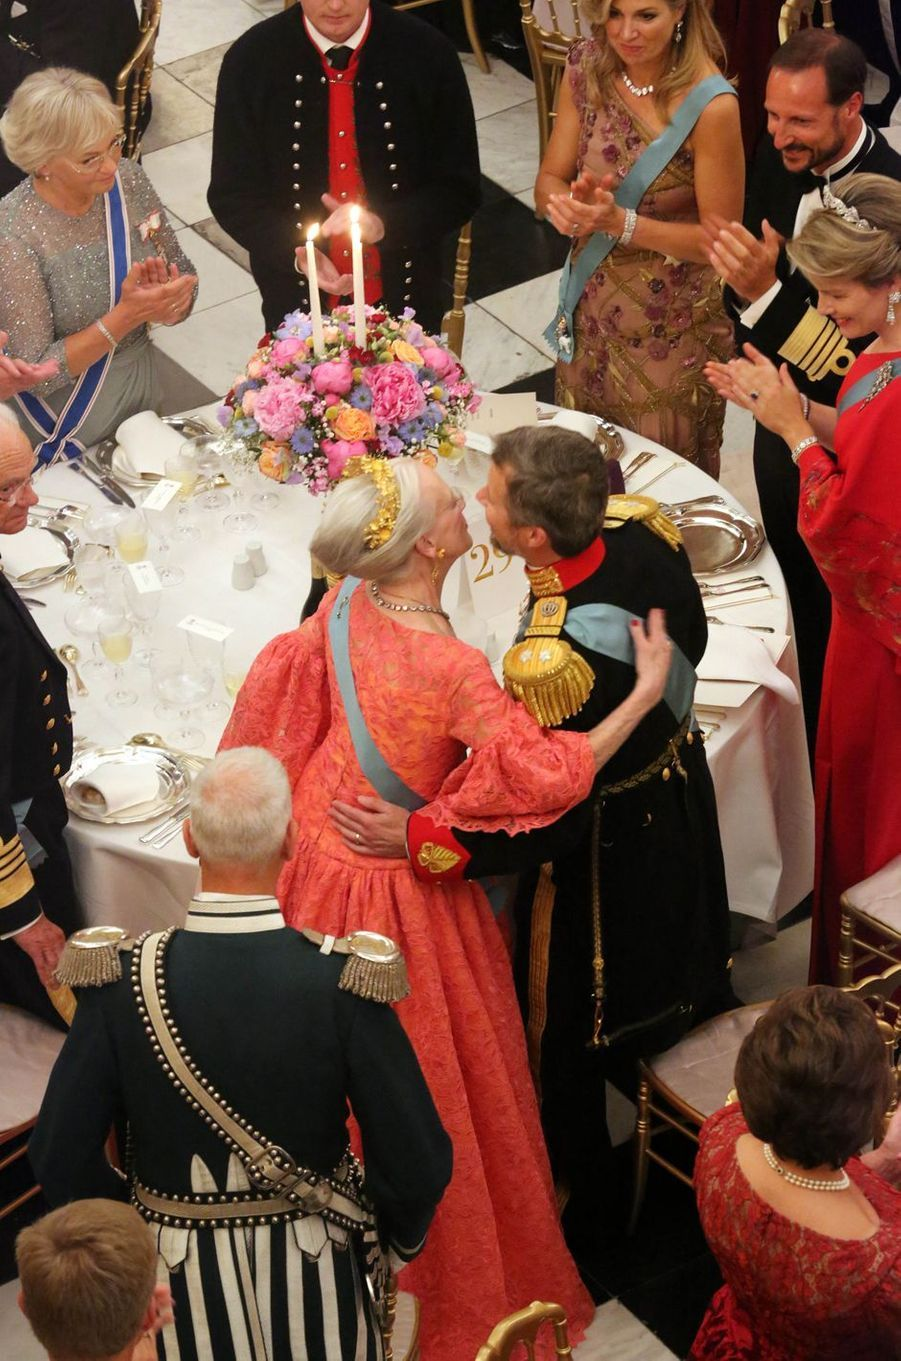 Le prince Frederik de Danemark avec sa mère la reine Margrethe II, le 26 mai 2018